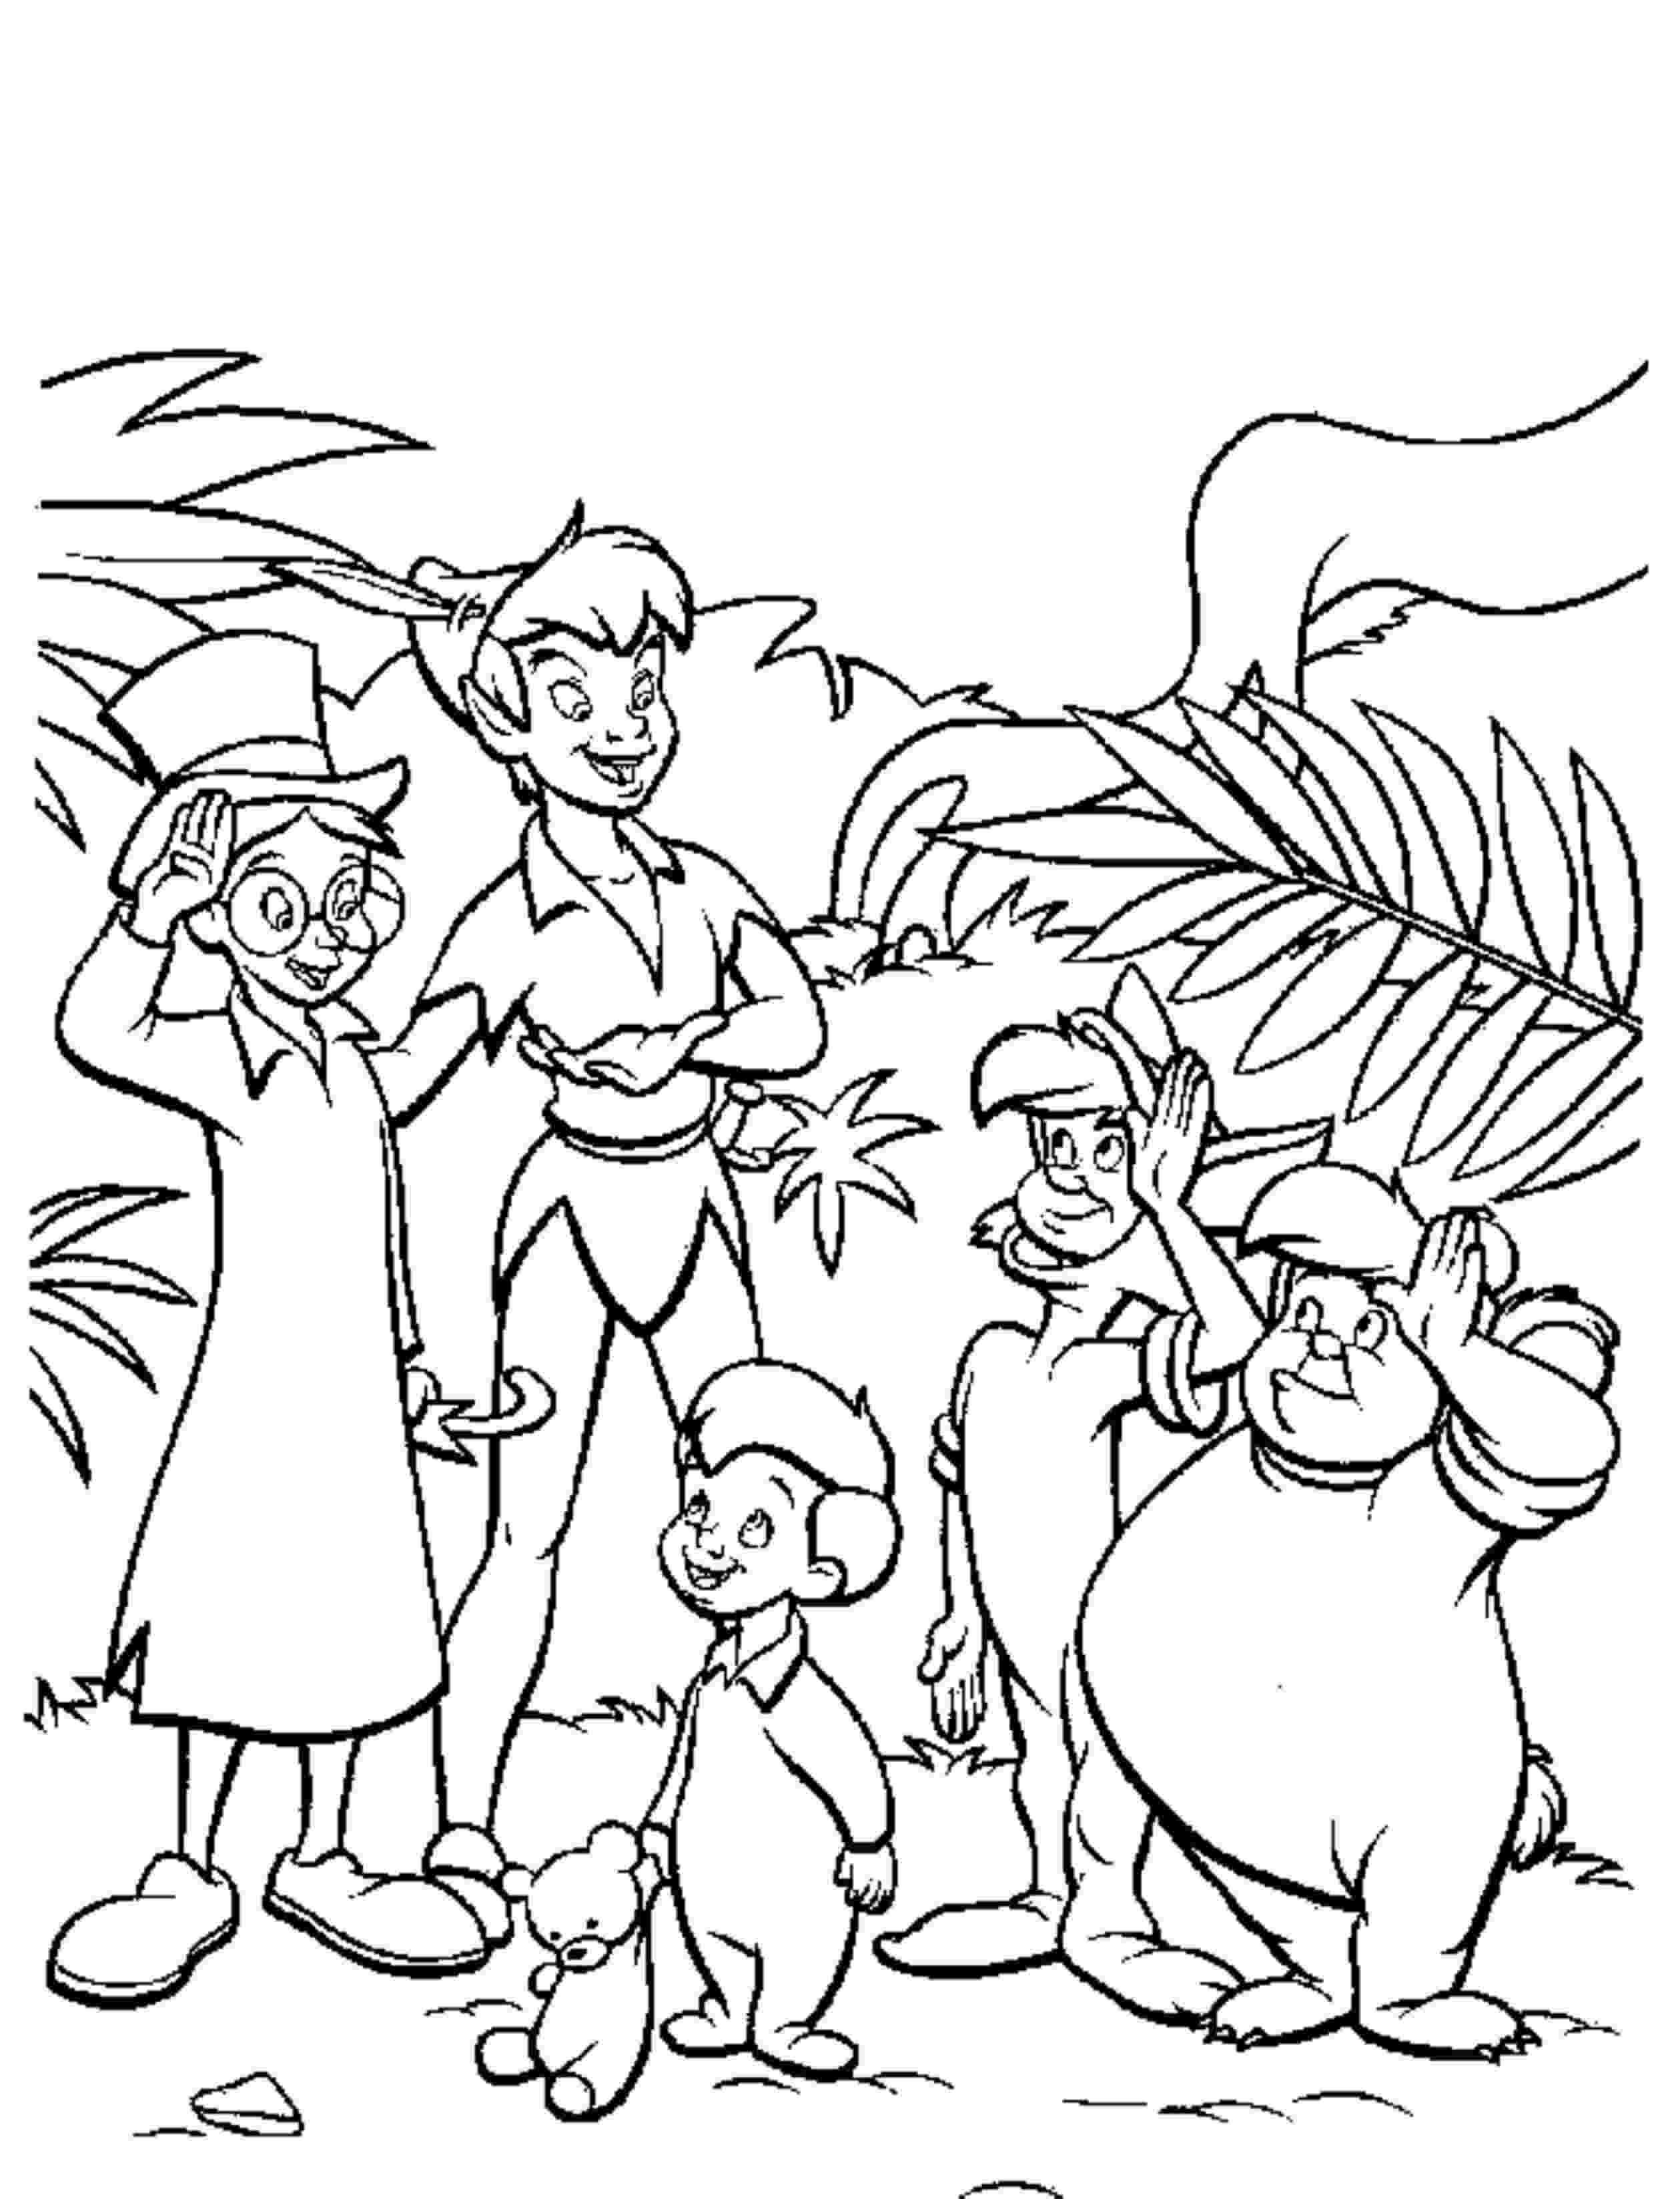 peter pan coloring pages free free printable peter pan coloring pages for kids pages free peter pan coloring